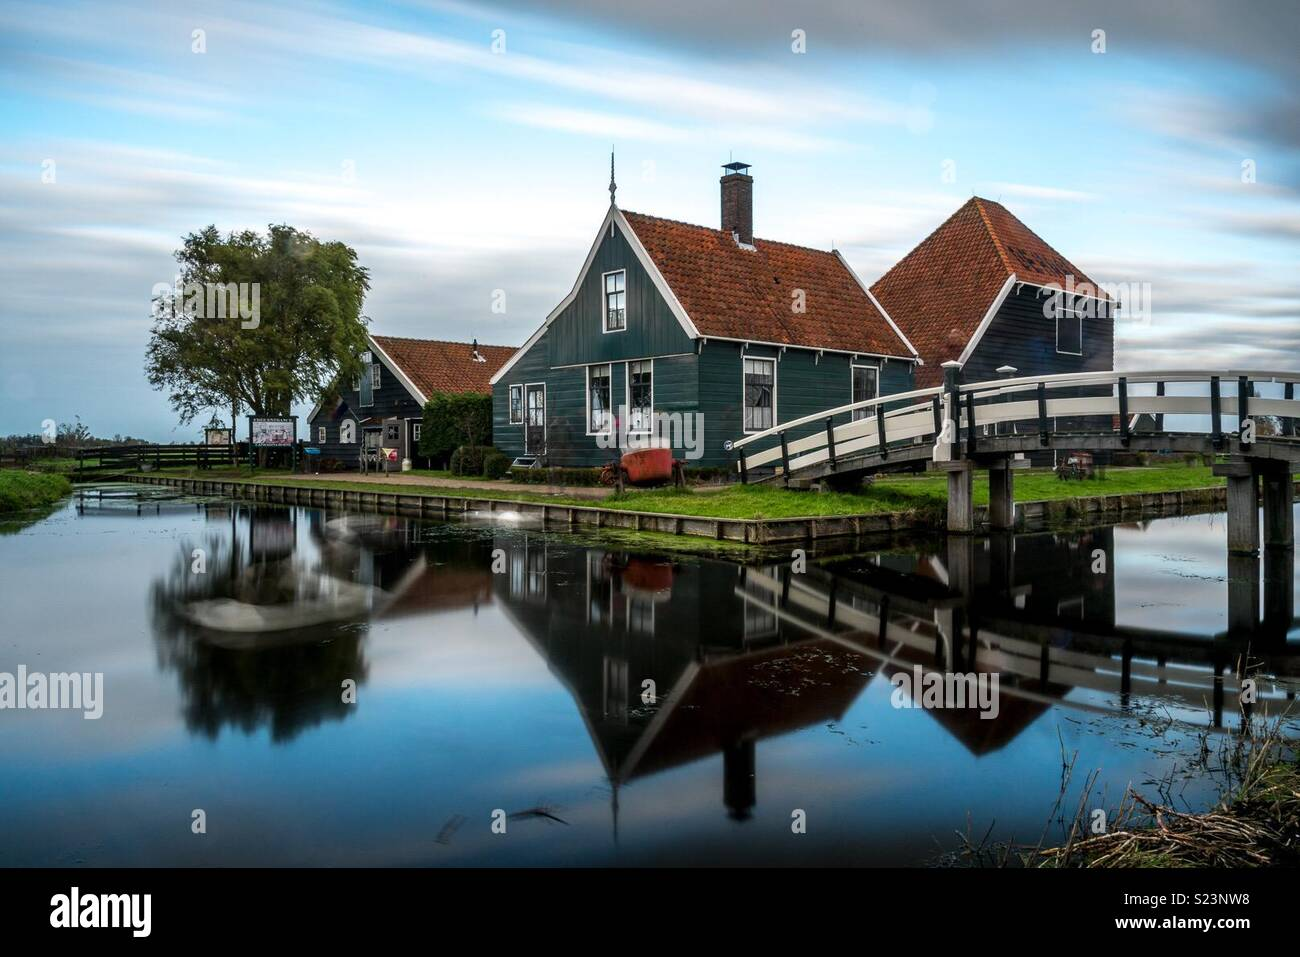 Cheese shop, Zaanse Schans, Netherlands - Stock Image